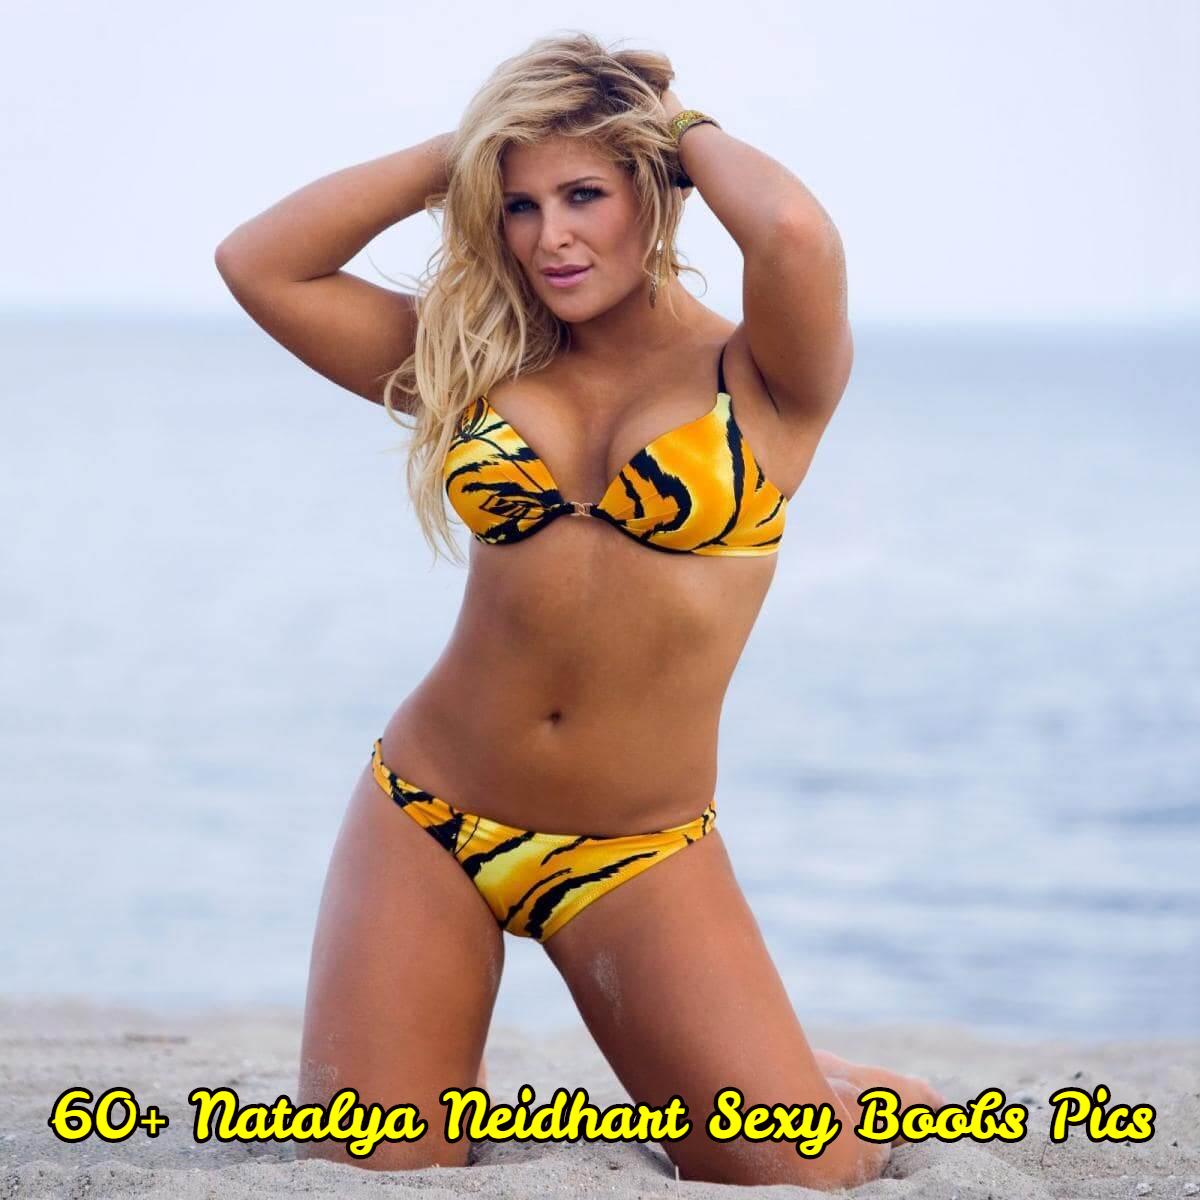 Natalya Neidhart sexy boobs pics